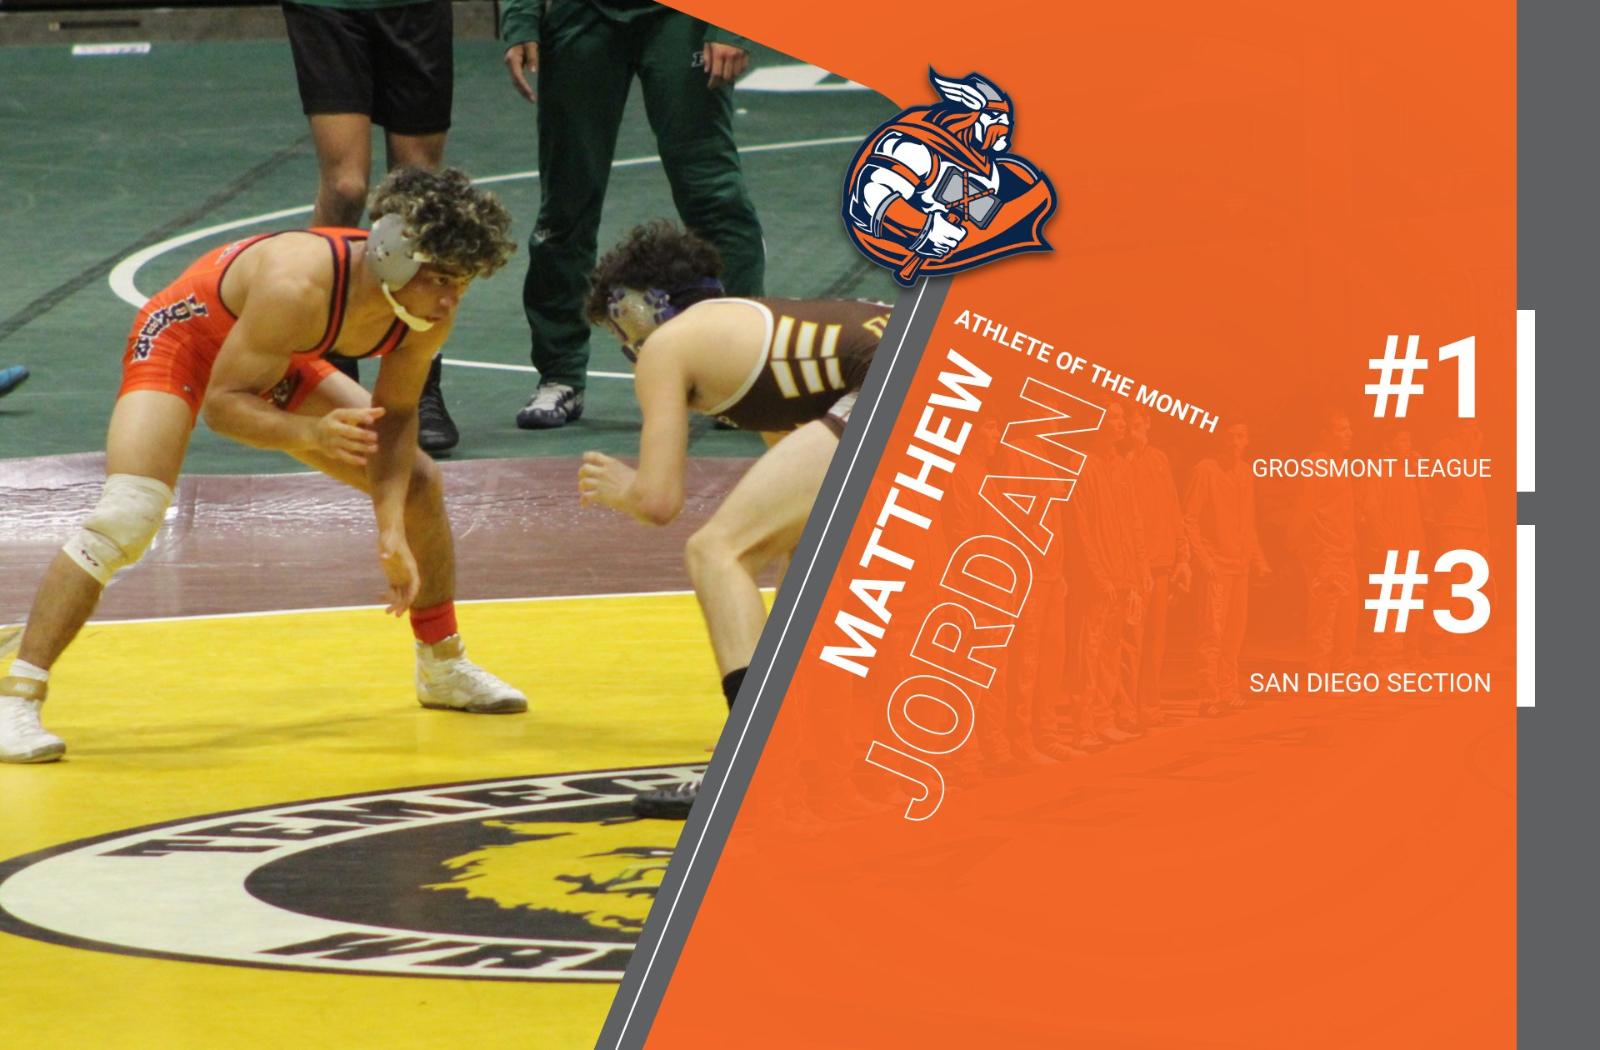 Matthew Jordan – Valhalla's Athlete of the Month!